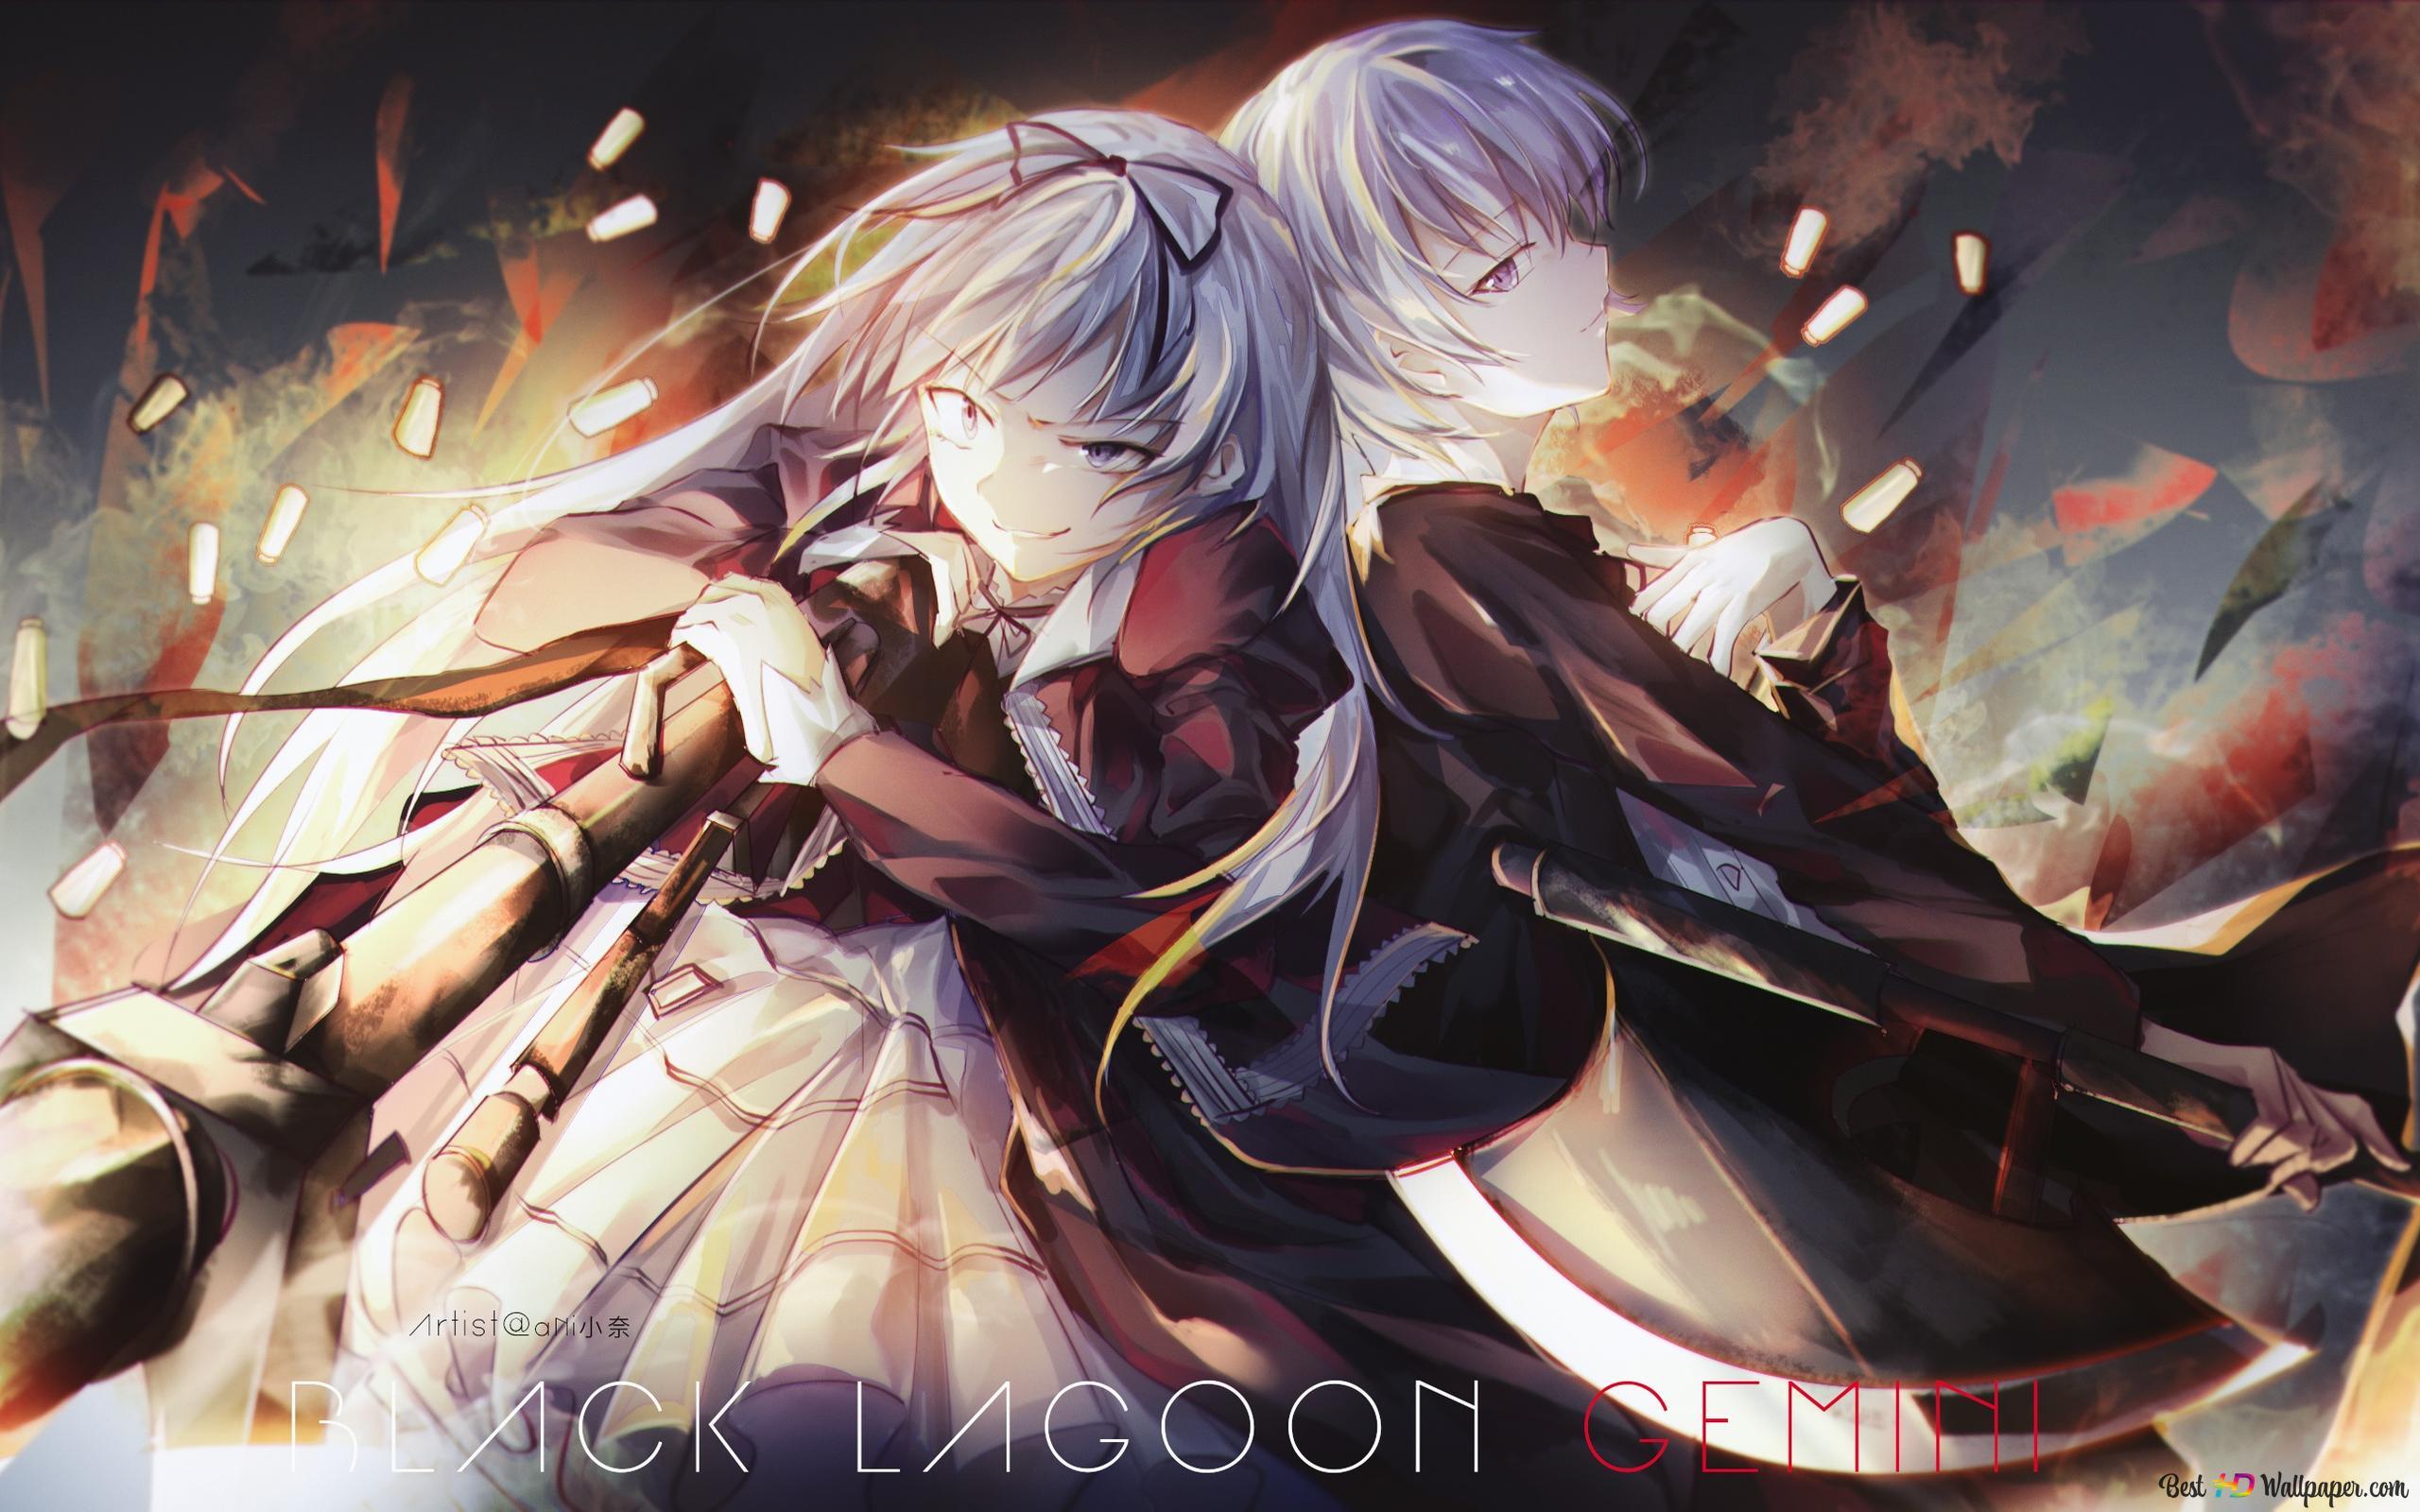 Black Lagoon Gemini Hd Wallpaper Download